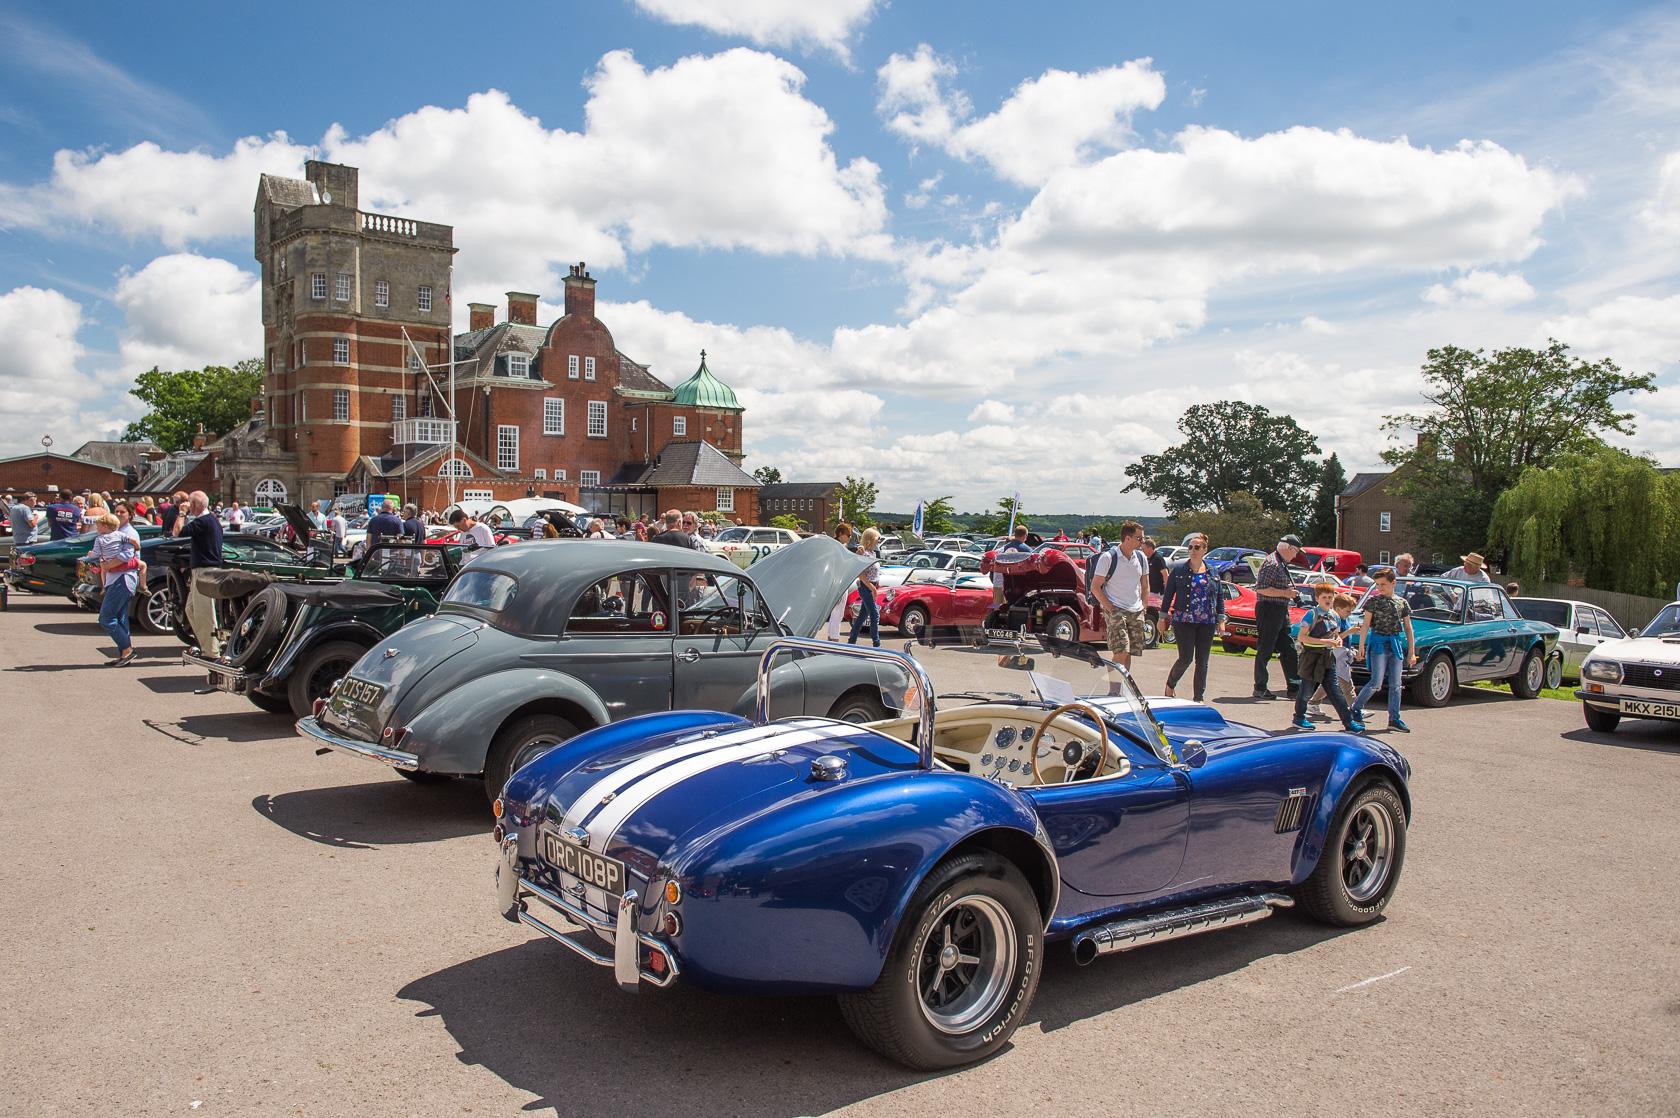 pangbourne college classic car show proves a triumph | getreading